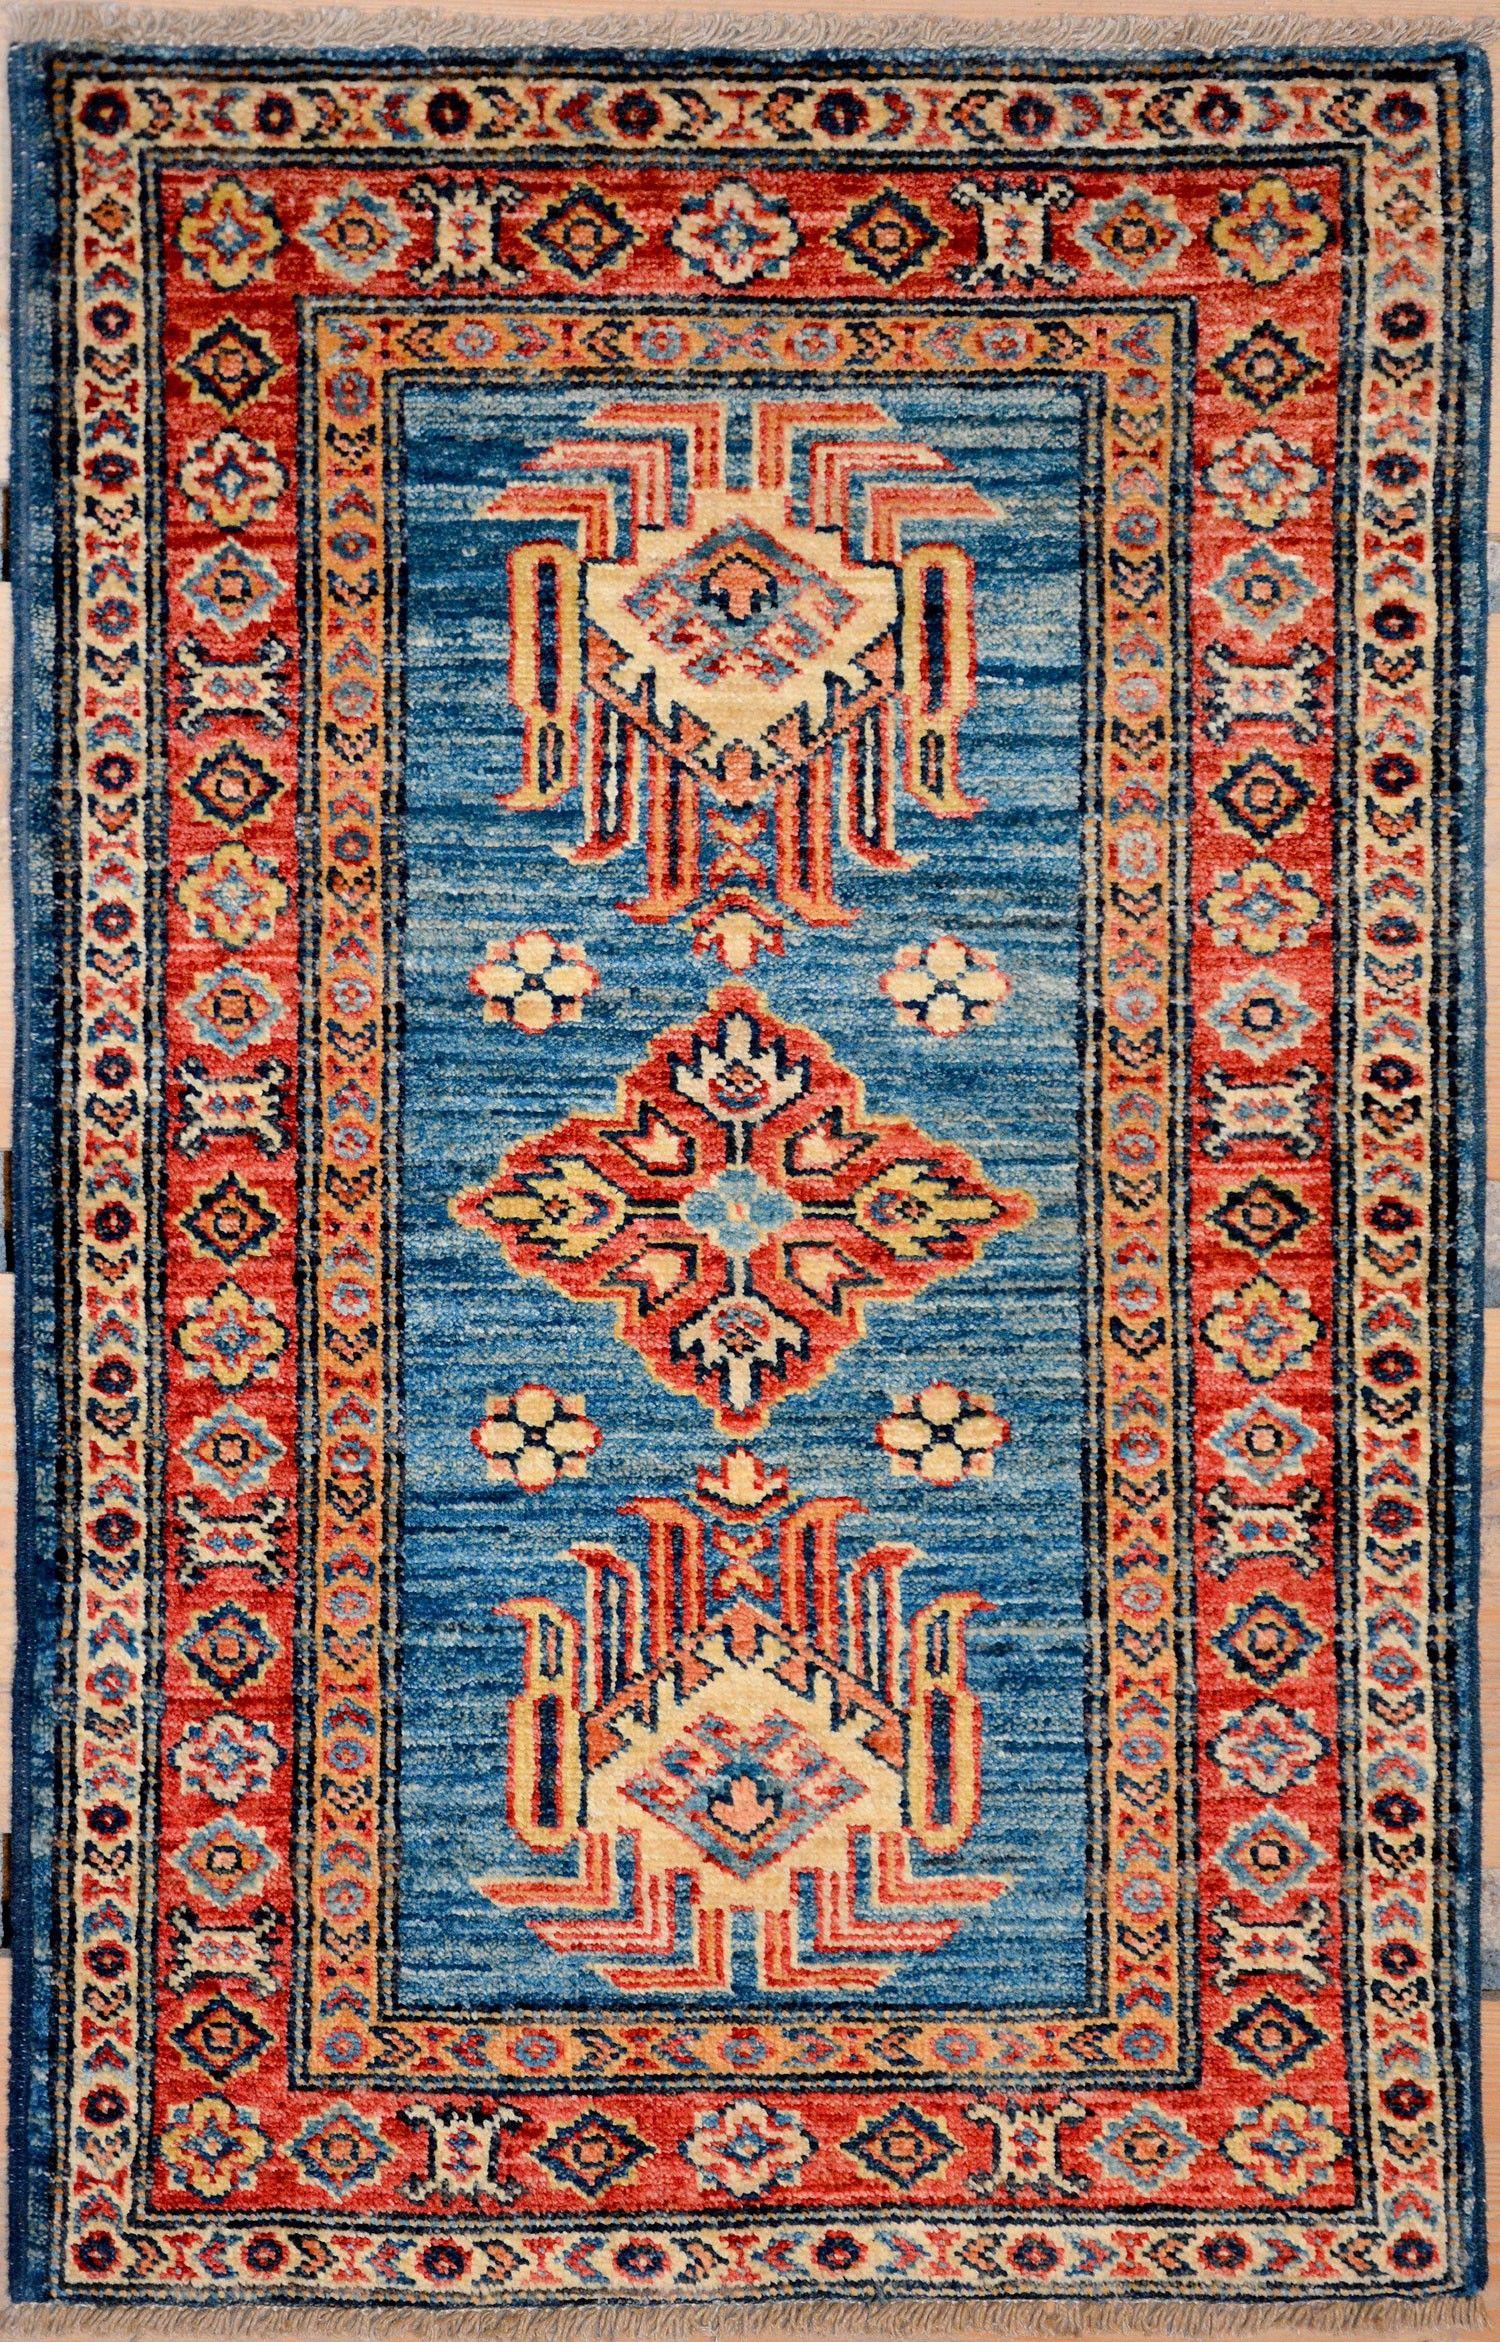 Turquoise Blue Oriental Kazak Rug 1 10 X 2 11 Ft No 11494 Http Alrug Com Turquoise Blue Oriental Kazak Rug 1 10 Rugs On Carpet Carpet Handmade Rugs